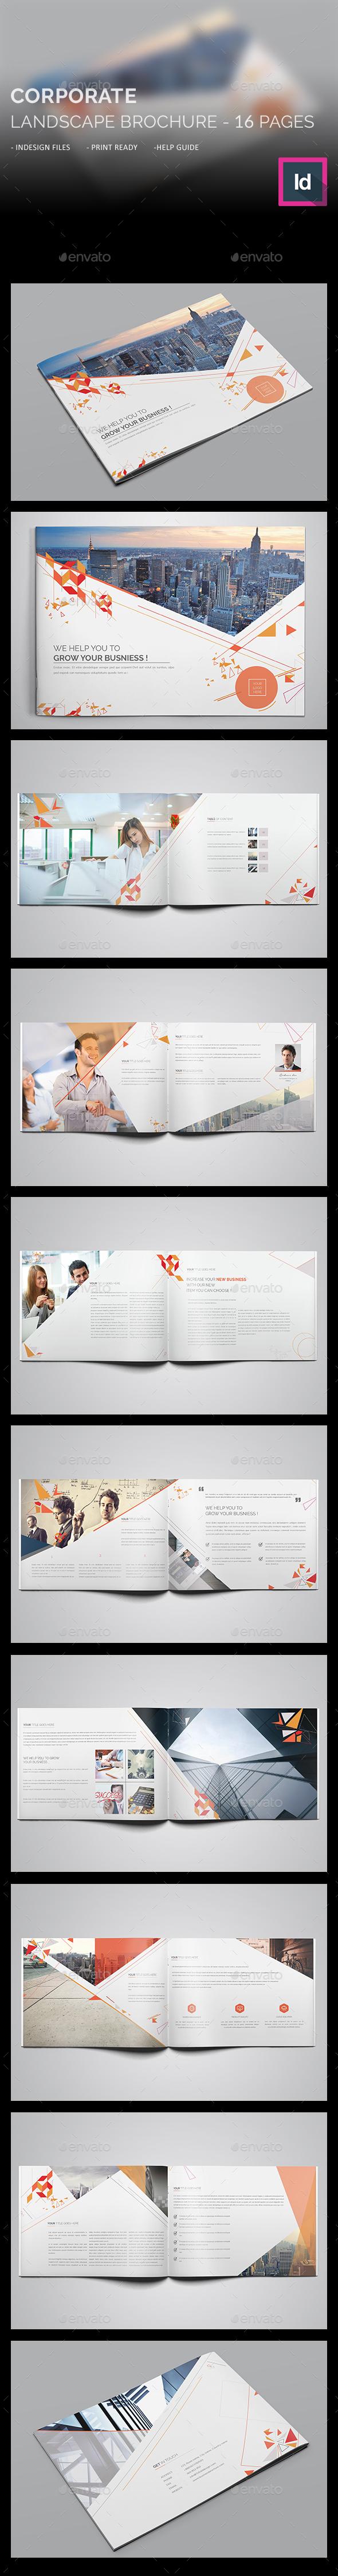 Corporate Landscape Brochure - Brochures Print Templates